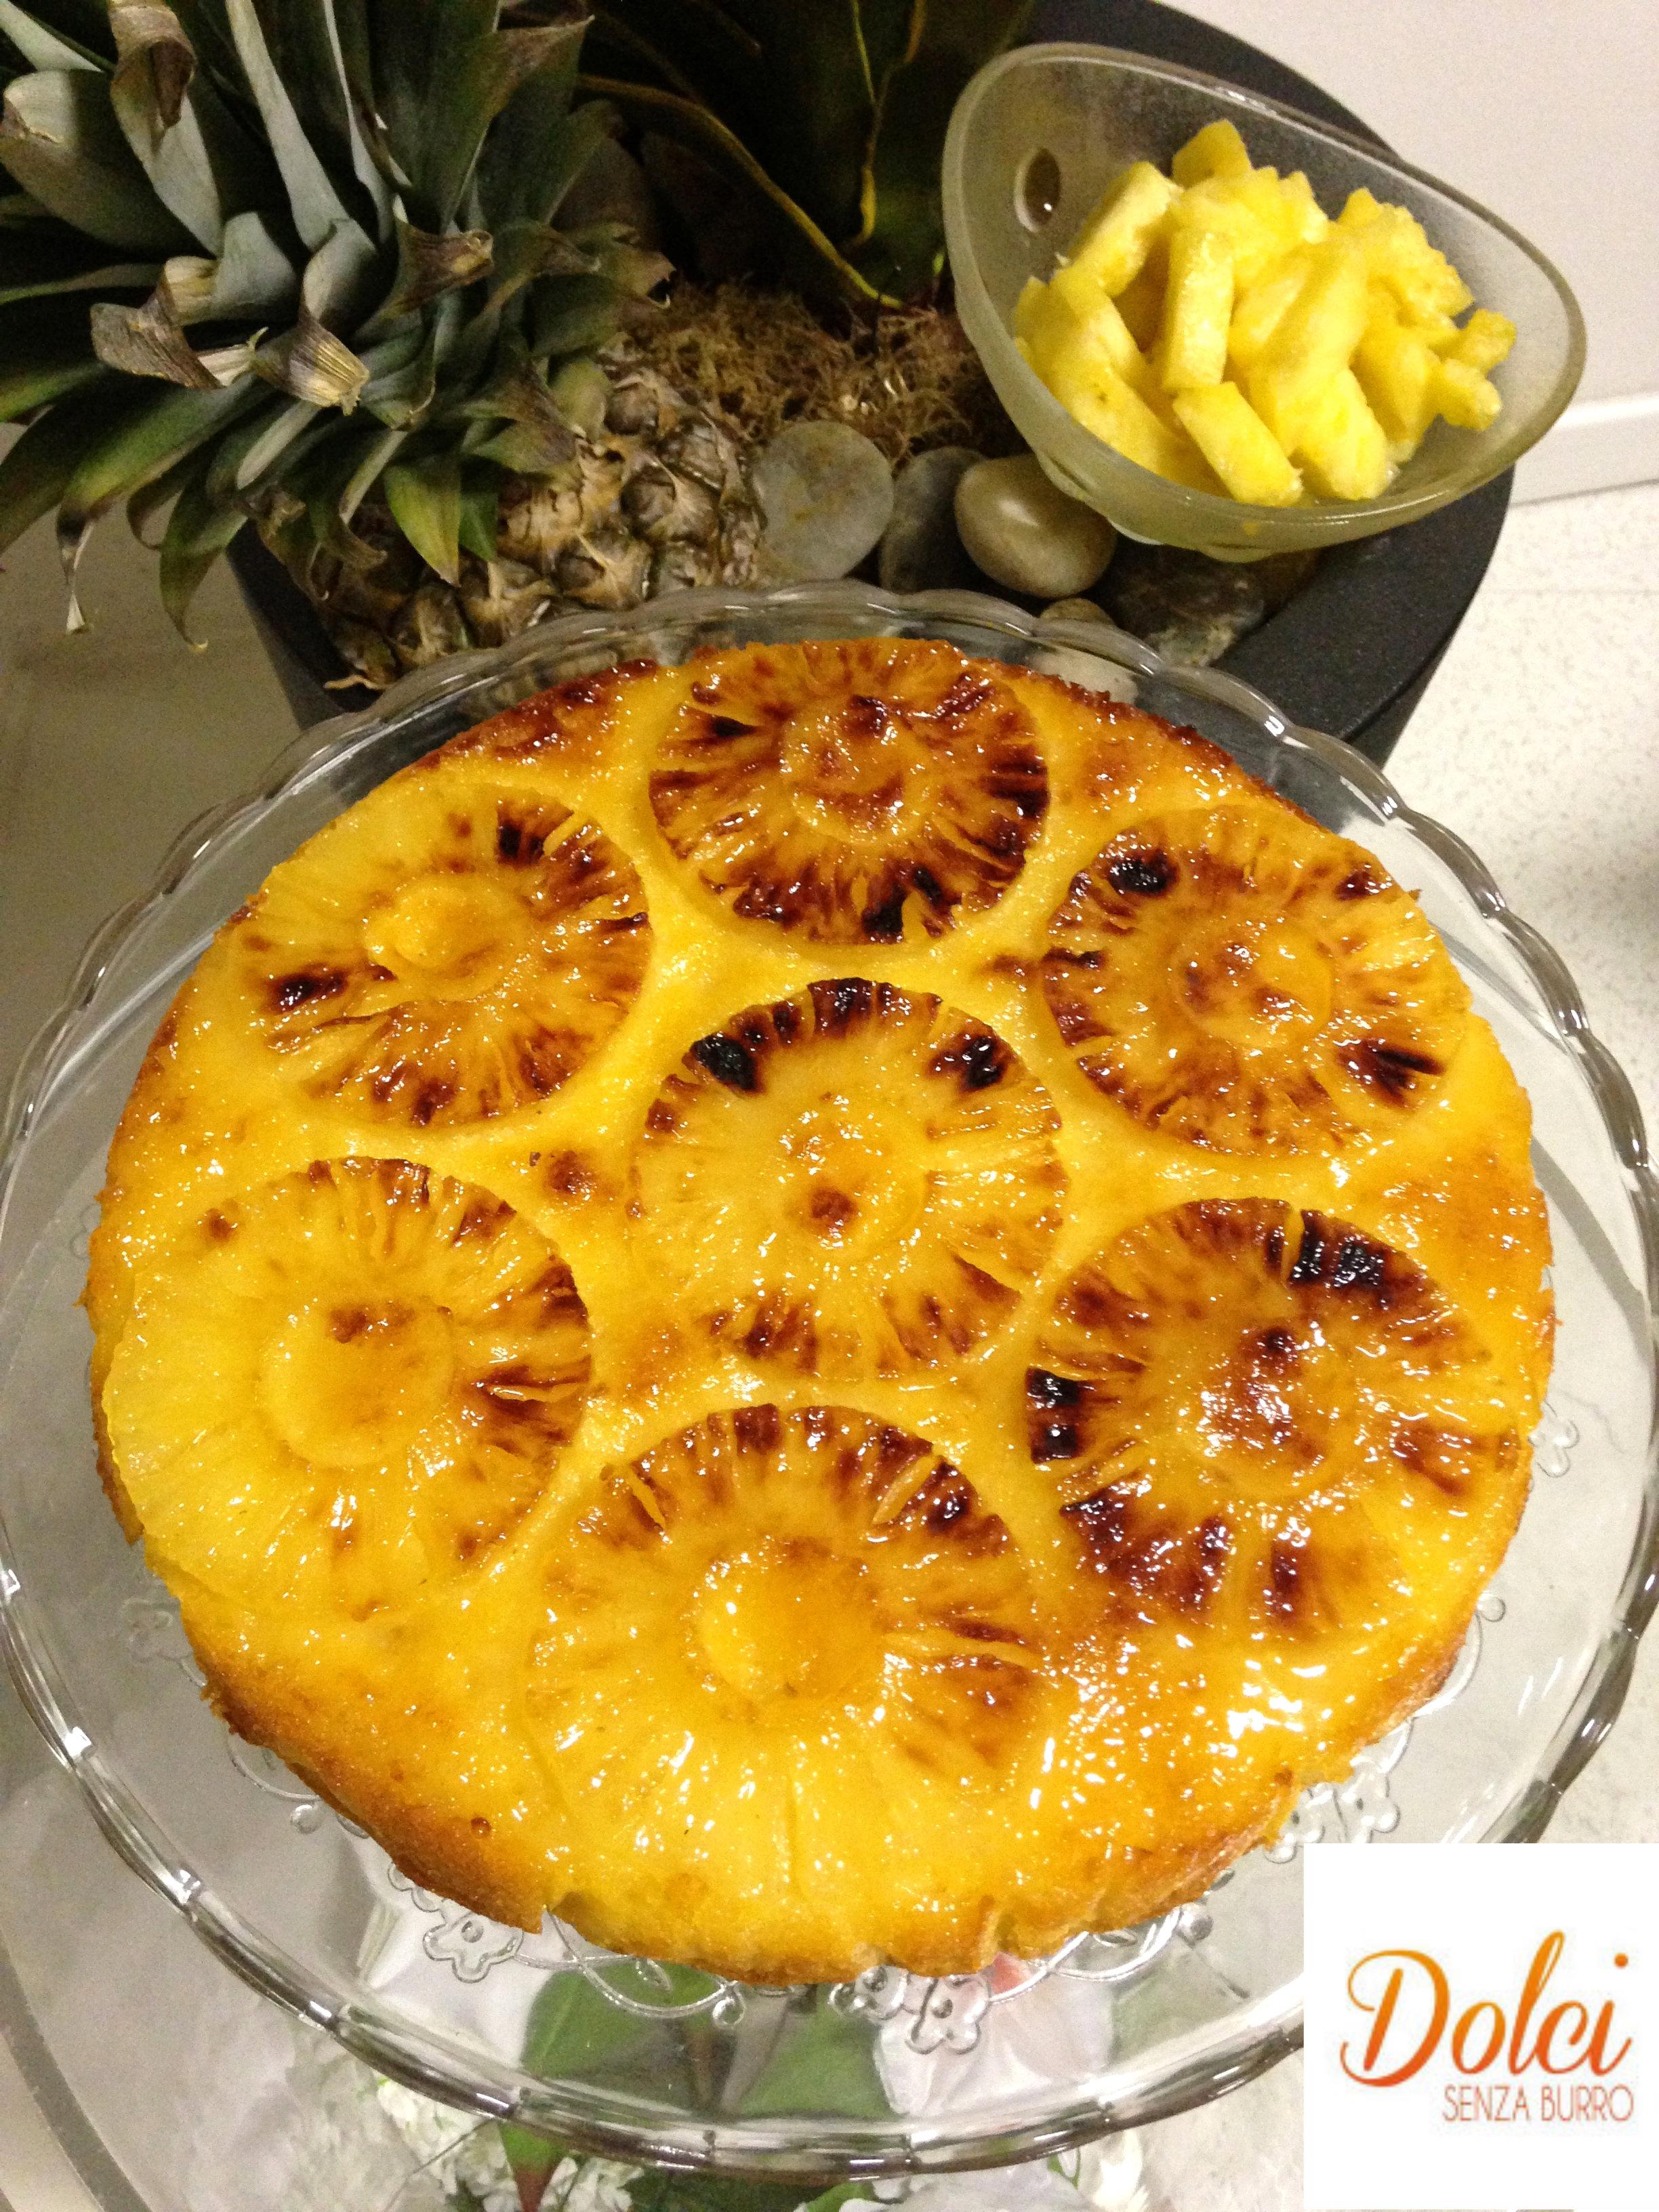 Torta Rovesciata all'Ananas , un dolce goloso e leggero di dolci senza burro